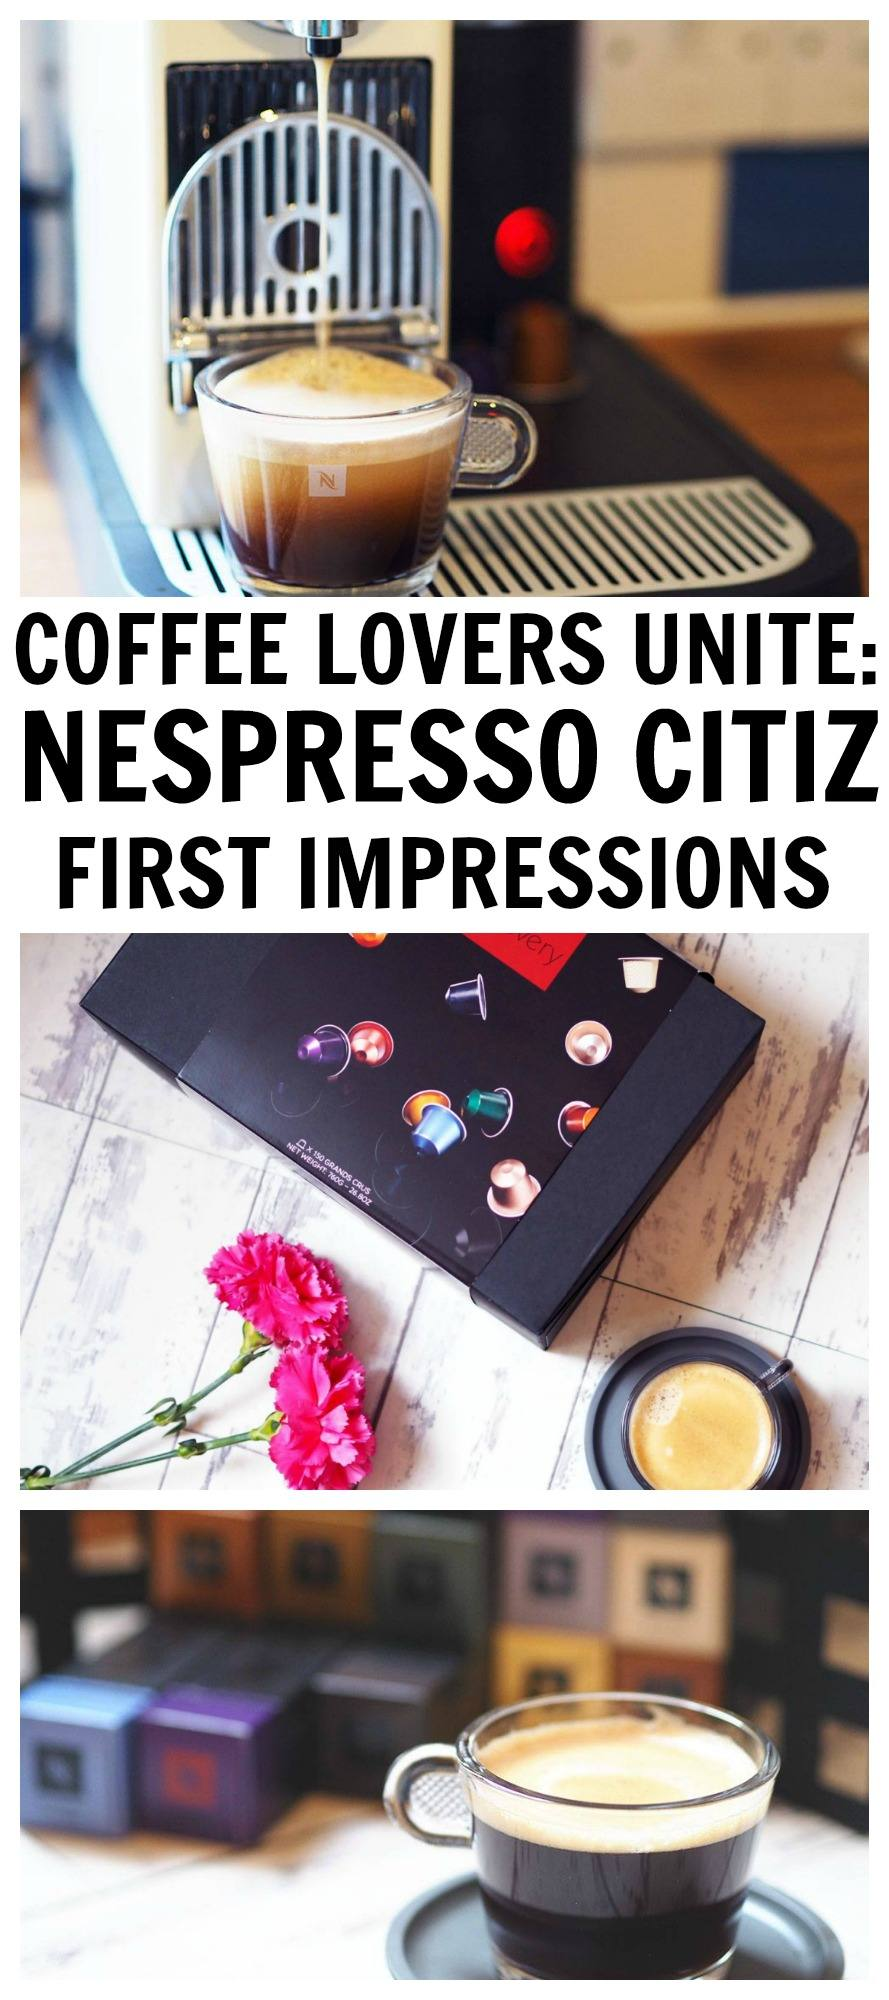 Coffee Lovers Unite Nespresso Citiz First Impressions